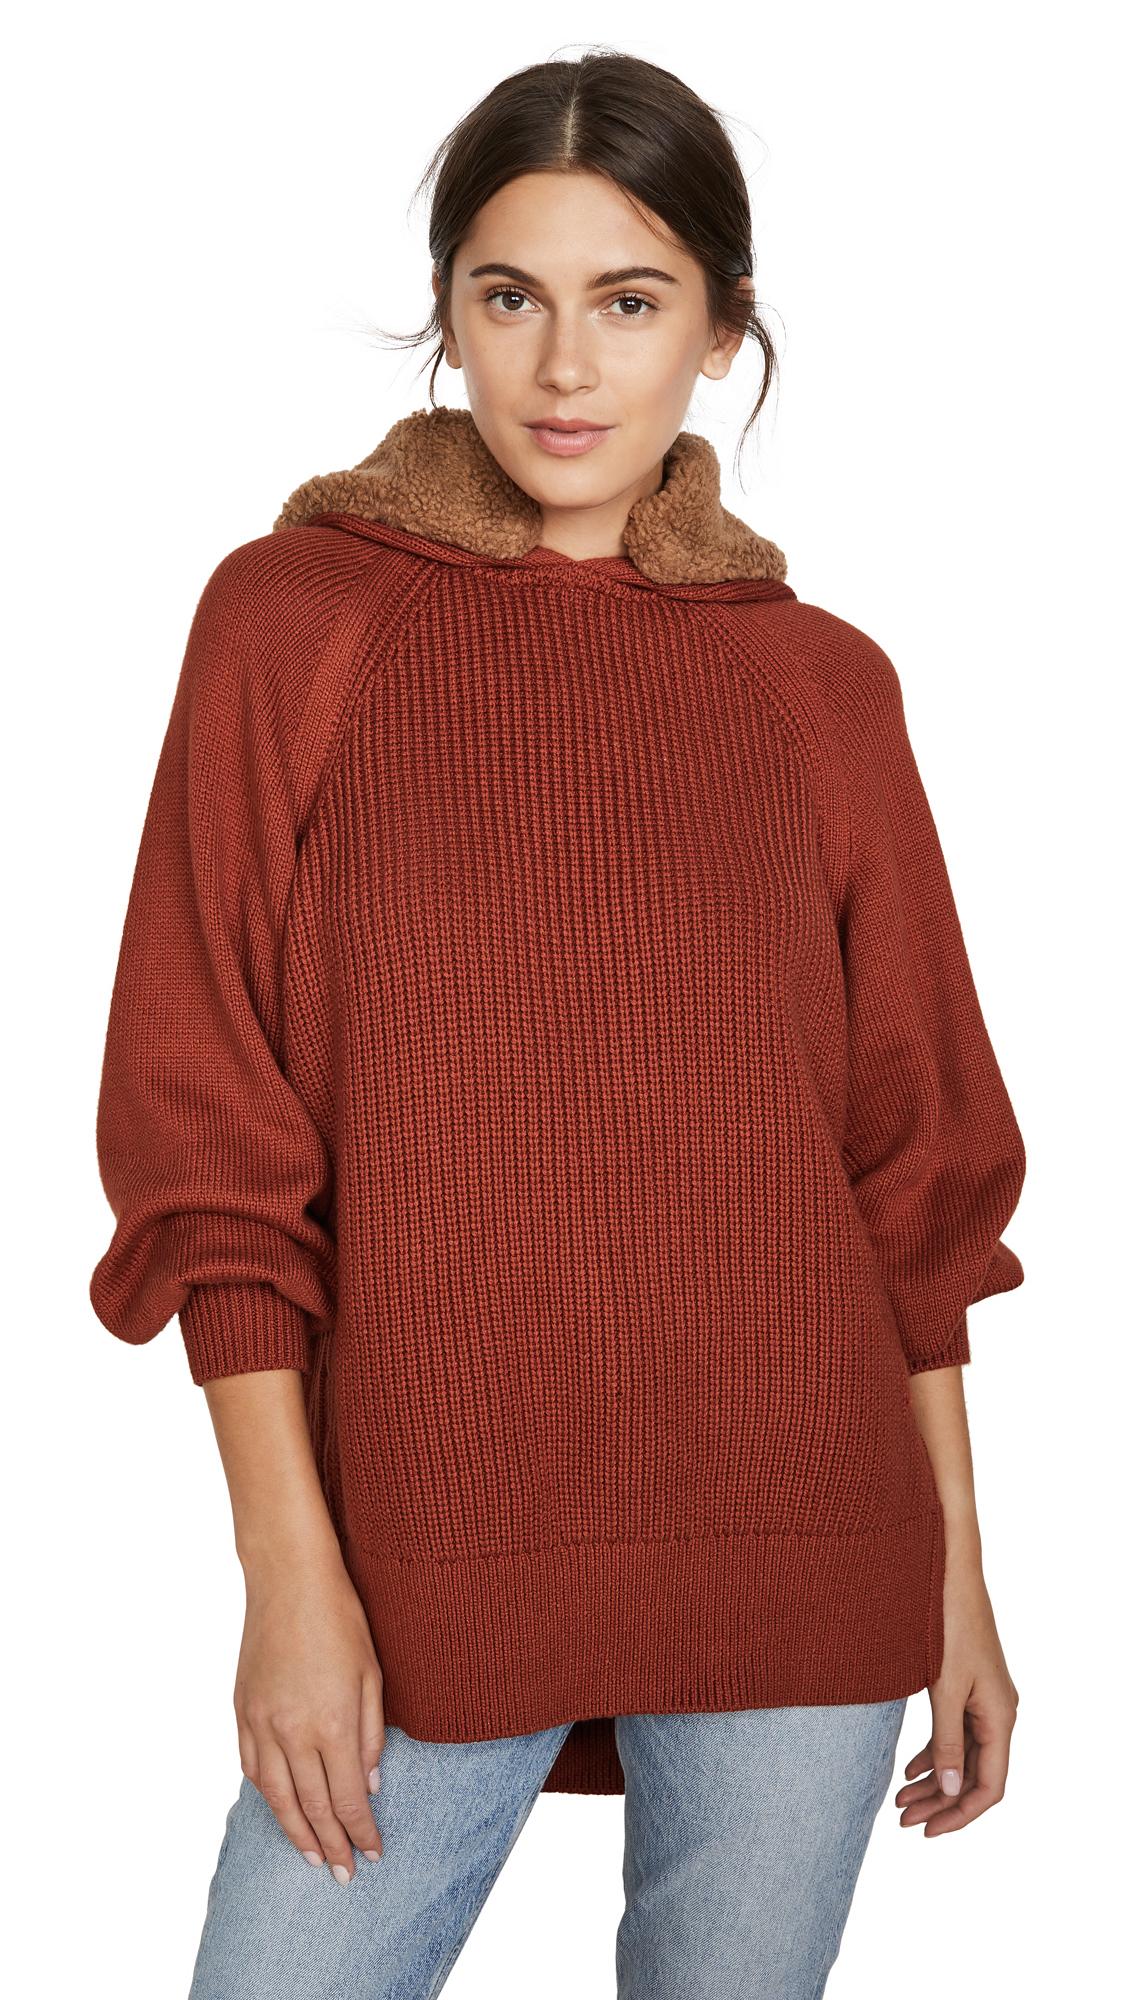 Adeam Faux Fur Trimmed Hoodie Sweater - Sienna